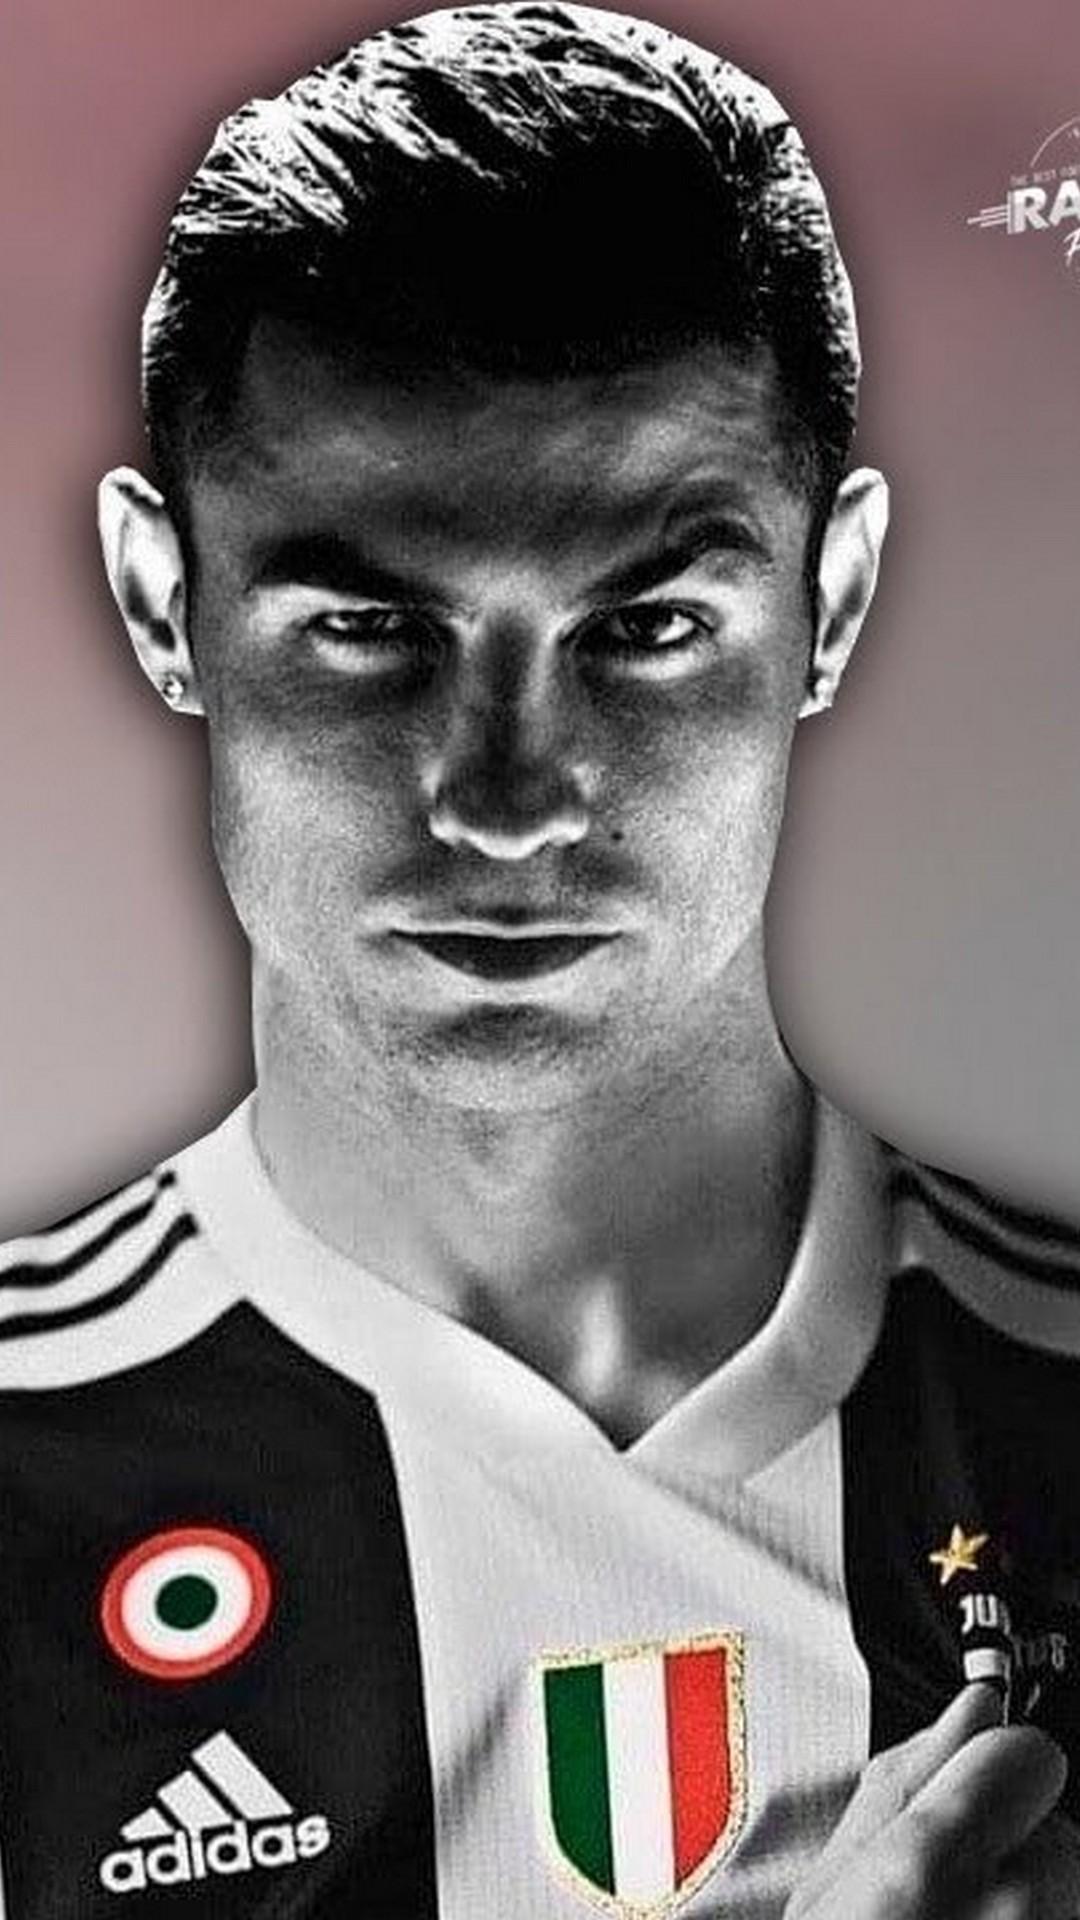 Wallpaper Cristiano Ronaldo Juventus Iphone With Image - Juventus Team Wallpaper Hd 2019 , HD Wallpaper & Backgrounds